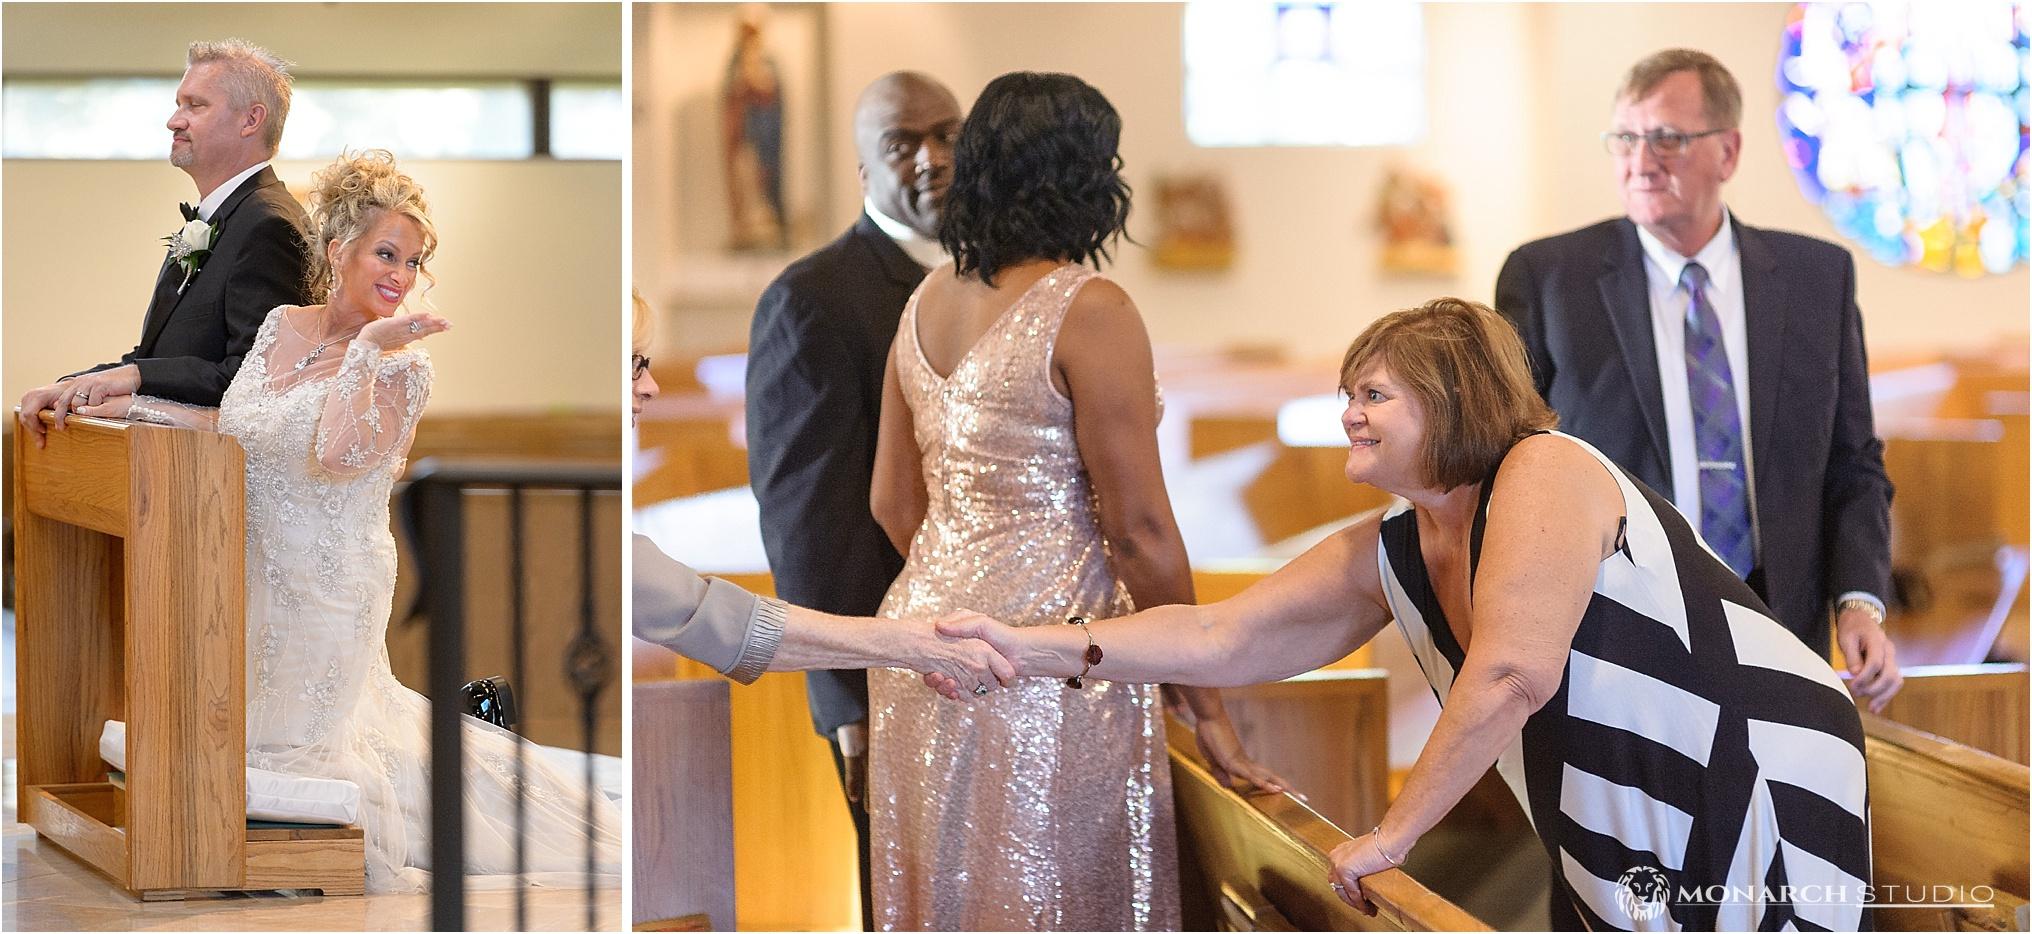 ponte-vedra-wedding-photographer-tpc064.jpg